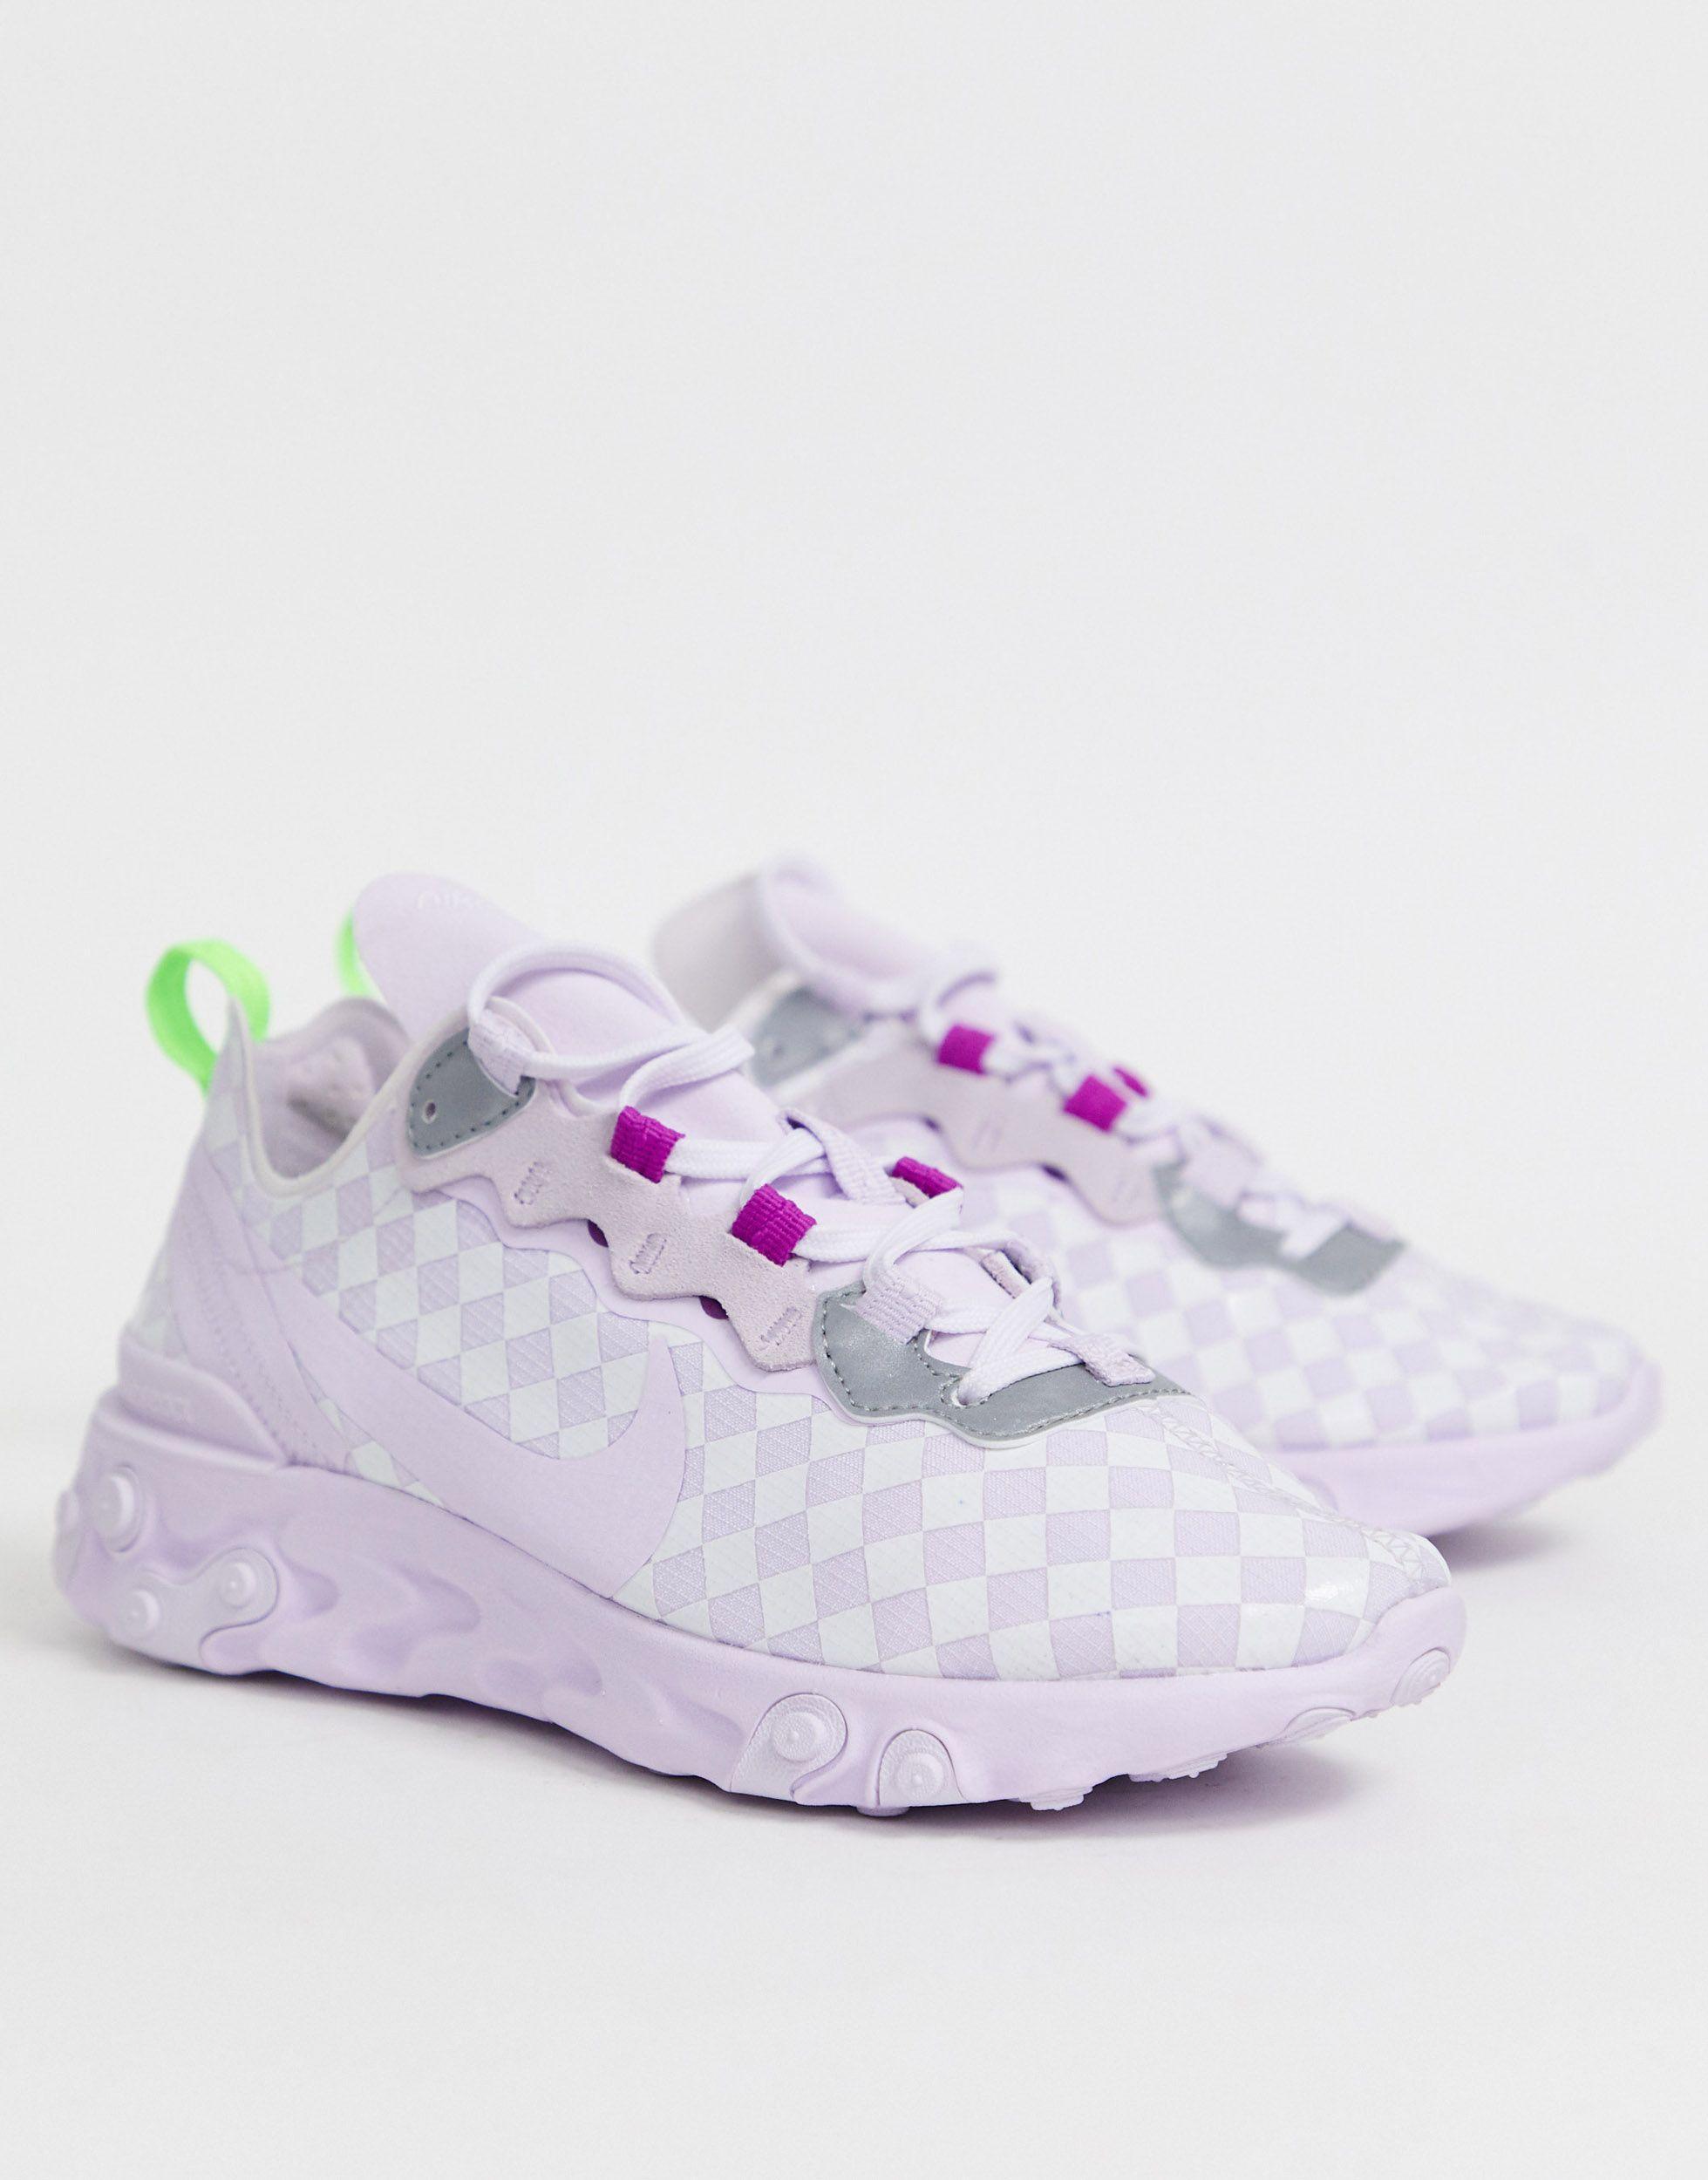 Tight Bambina Nike G NSW Lggng Favorite Gx3